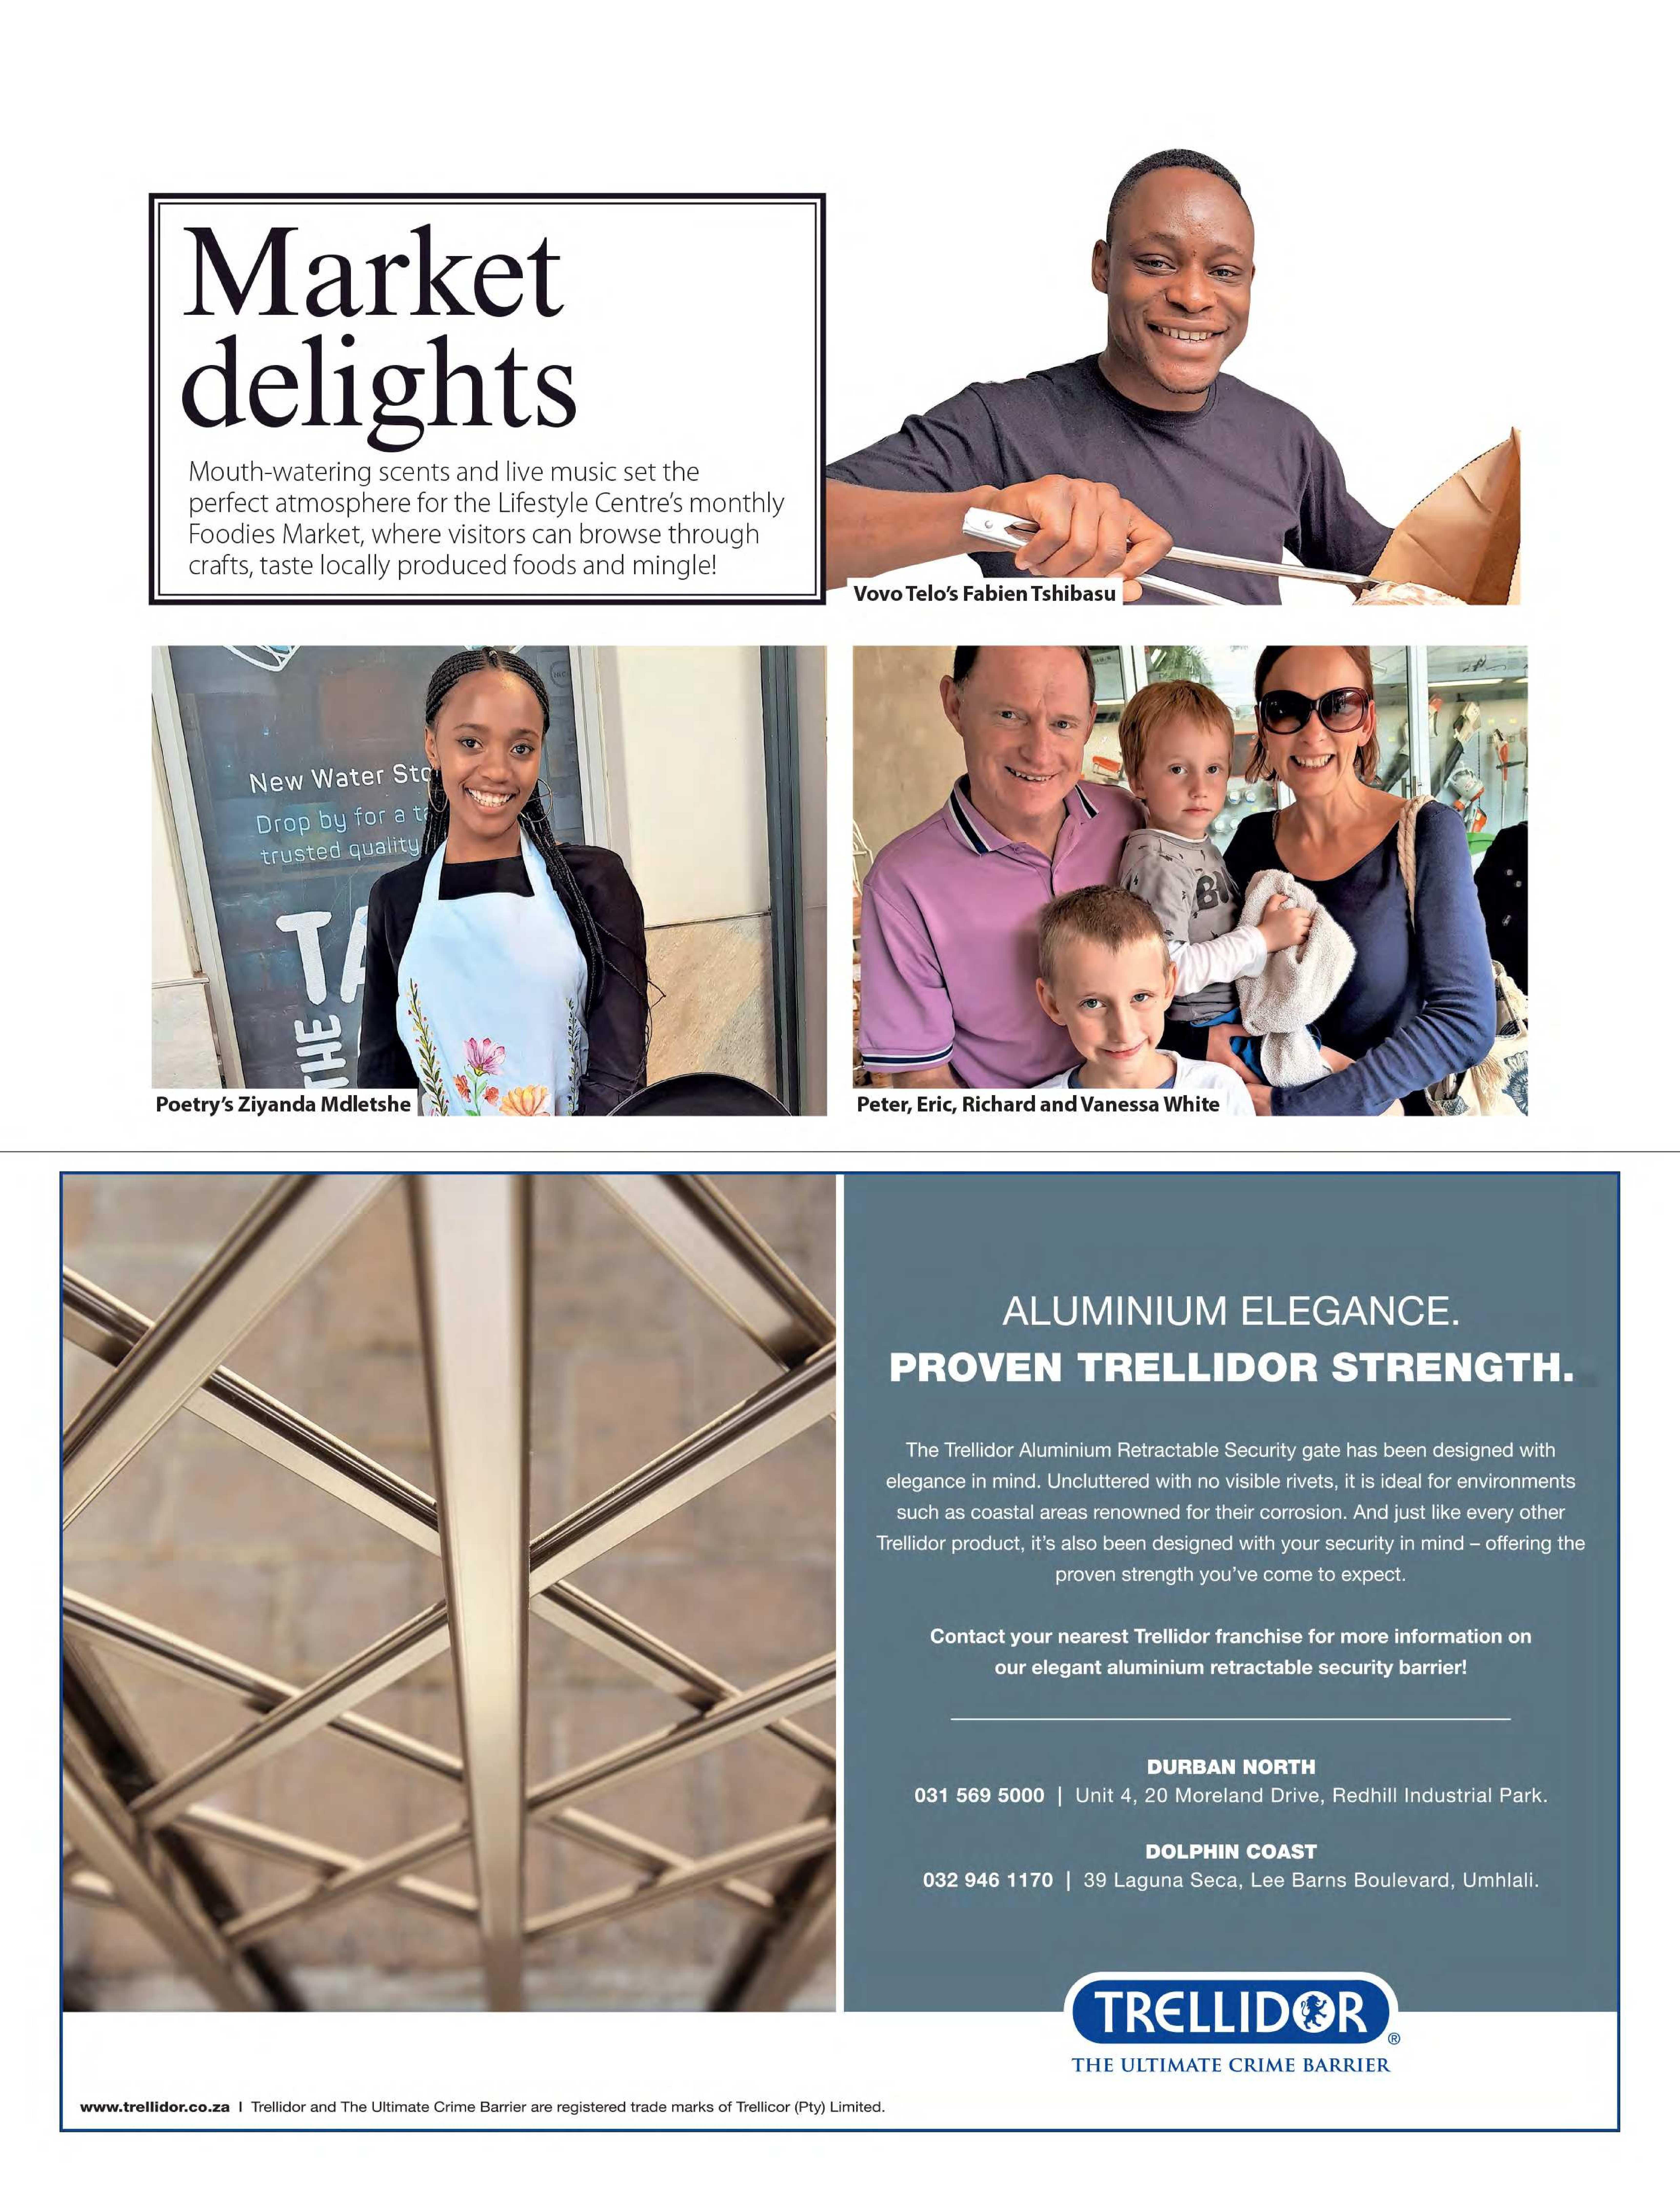 get-magazine-ballitoumhlanga-september-2018-epapers-page-14